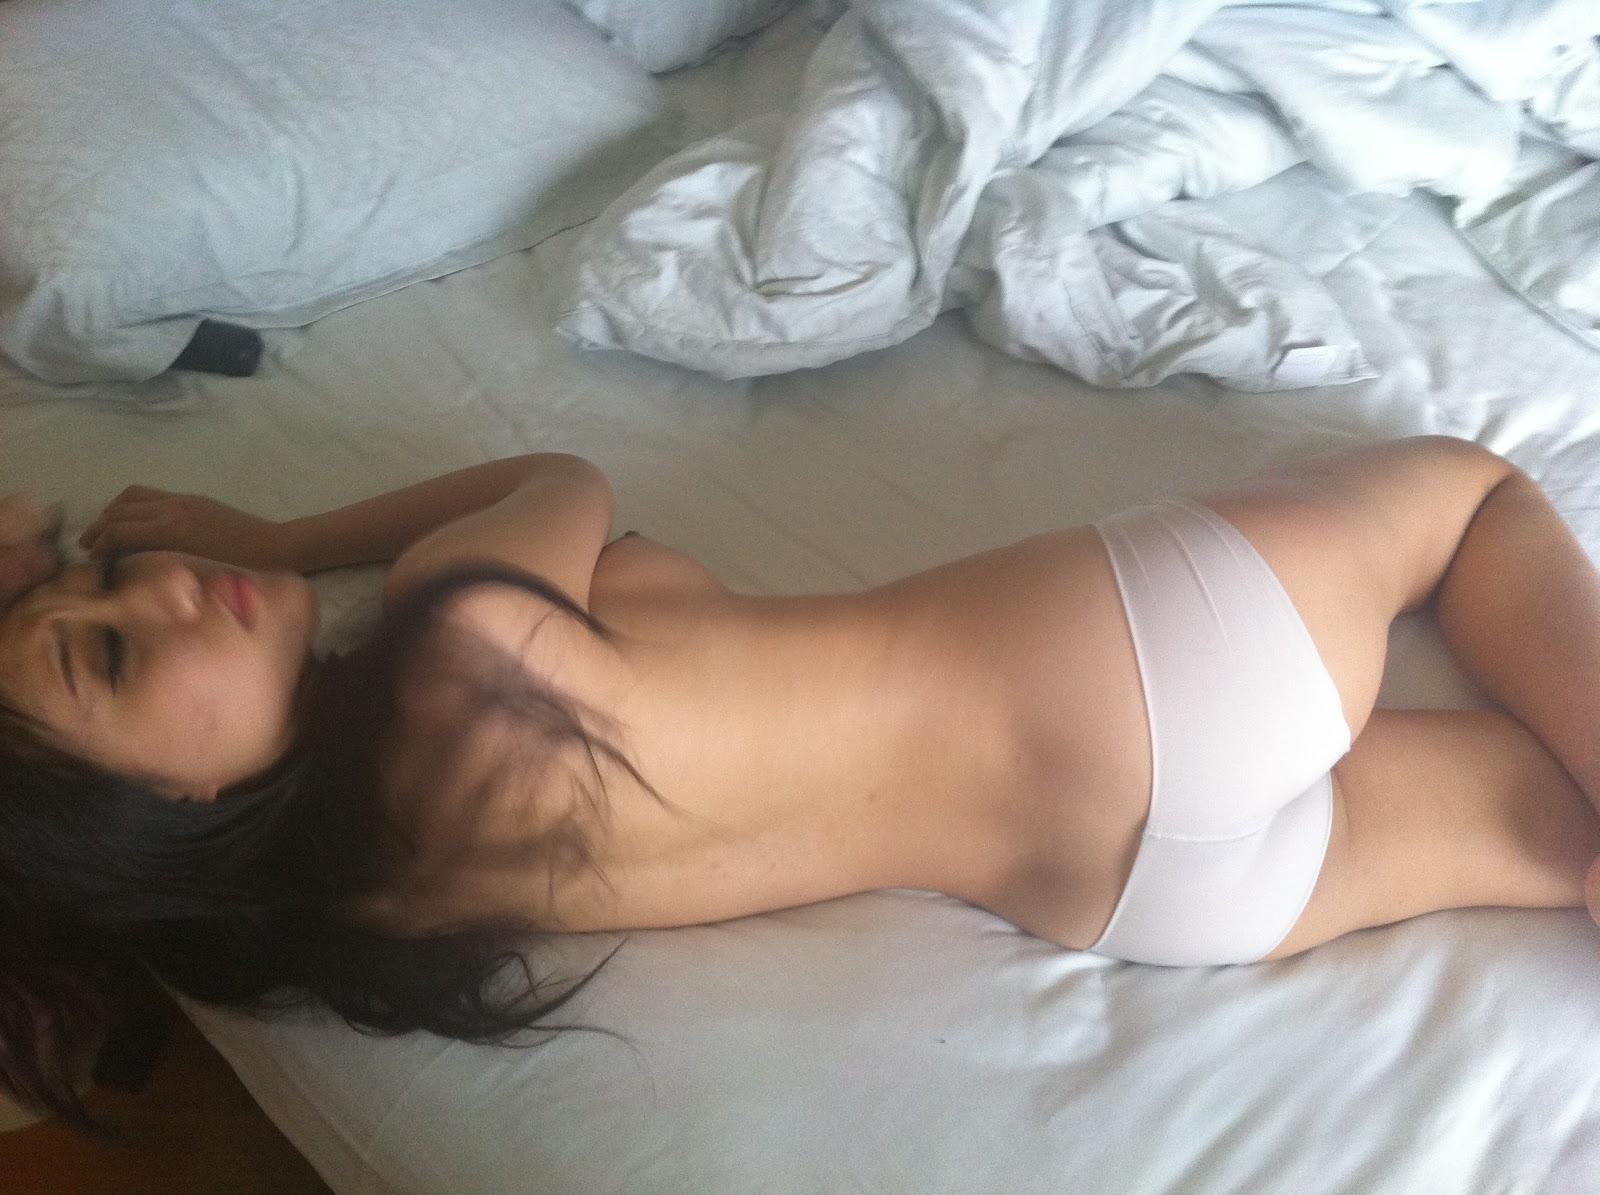 Cora Leaked Nude Sex Photos With Justin Lee In The Taiwan Celebrity Sex Scandal, hot sex scandal, nude girls, hot girls, Best Girl, Singapore Scandal, Korean Scandal, Japan Scandal